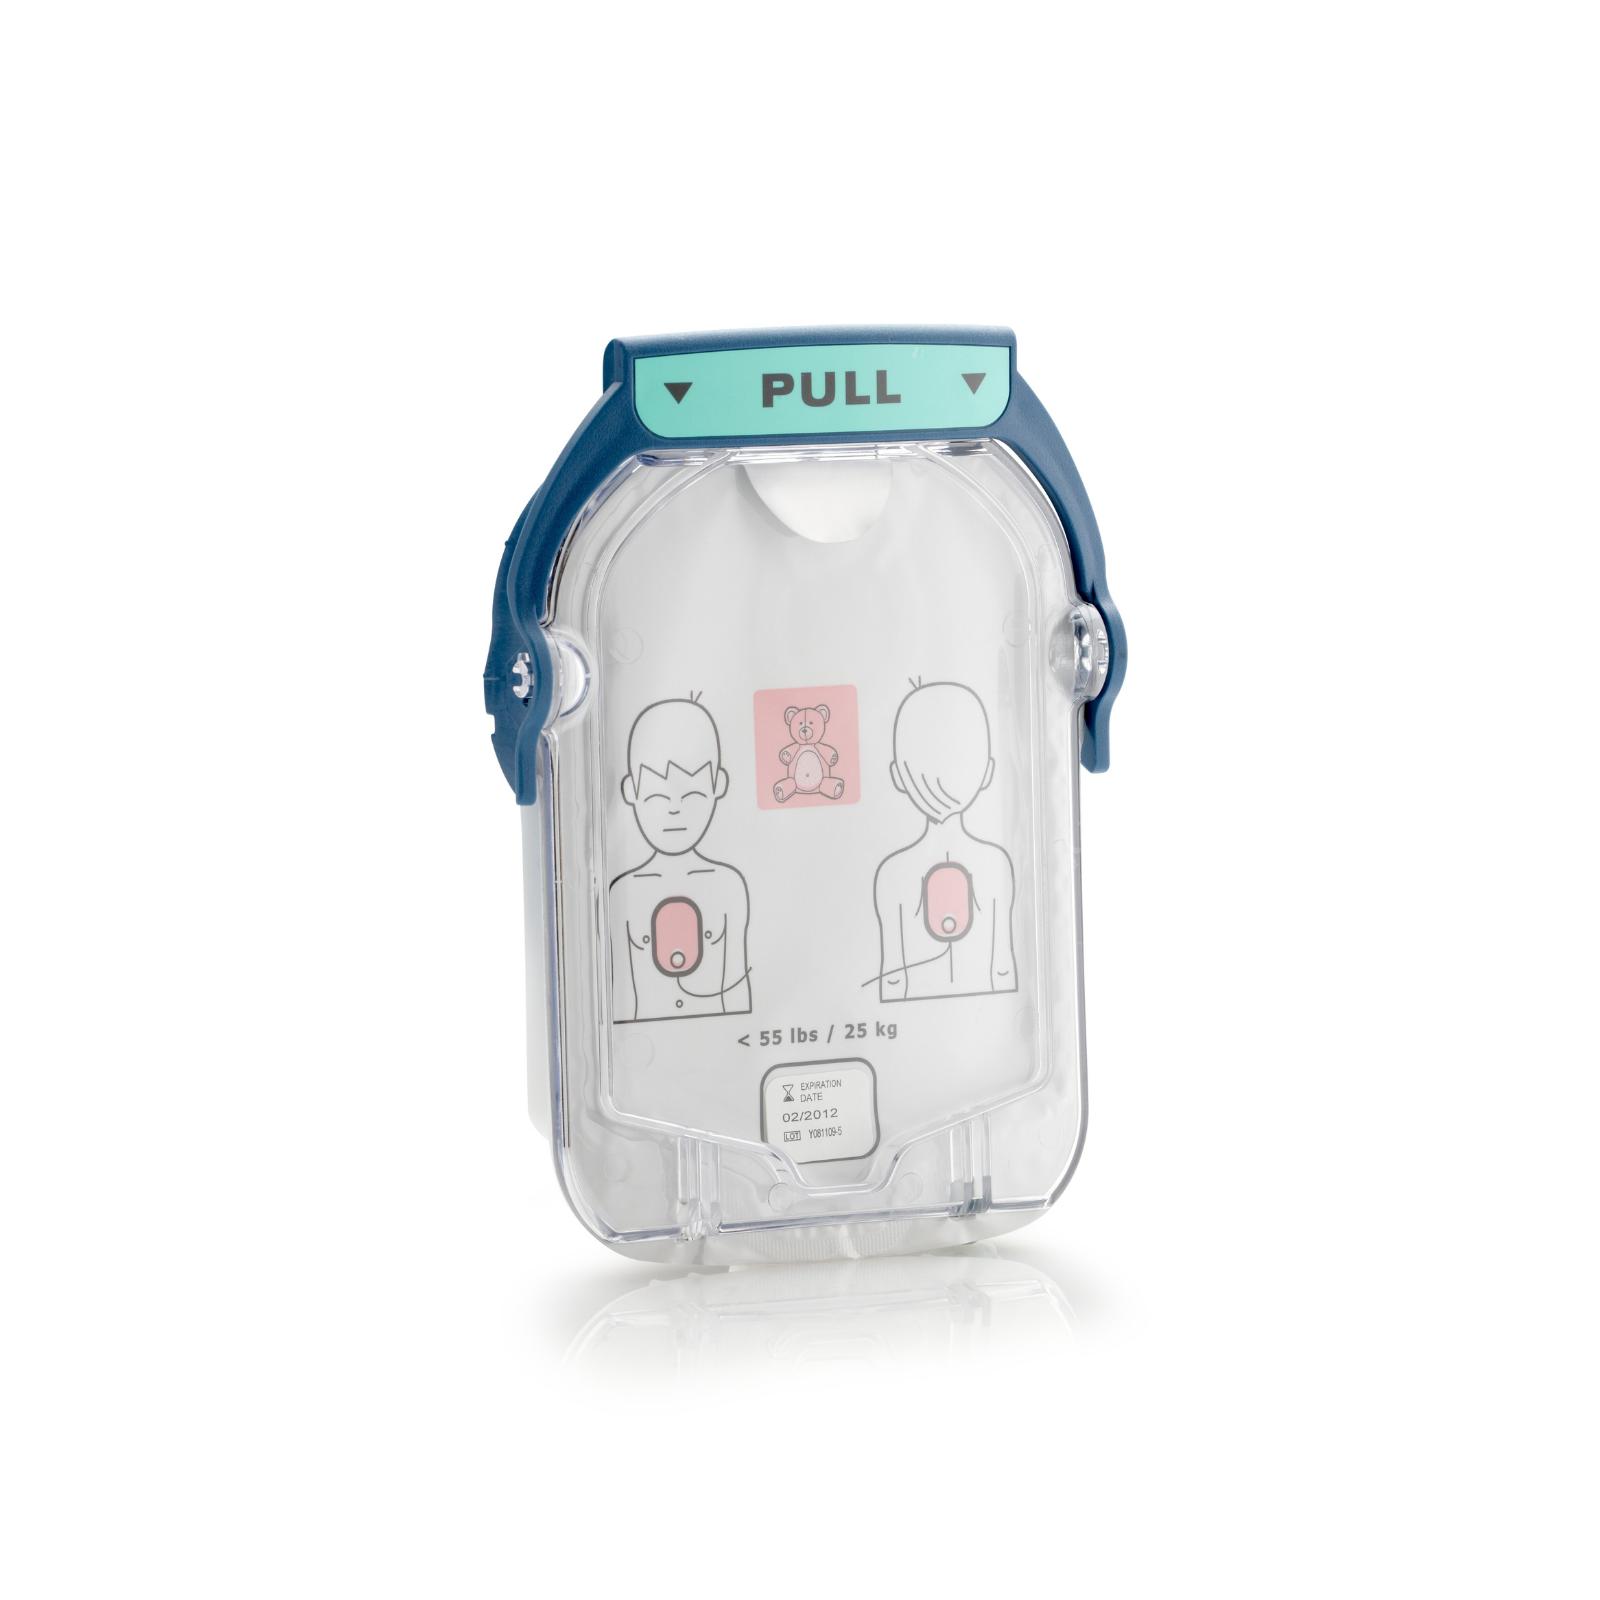 Picture of Philips HeartStart Infant/Child SMART Pads cartridge (1 pair), 1 U/Pk